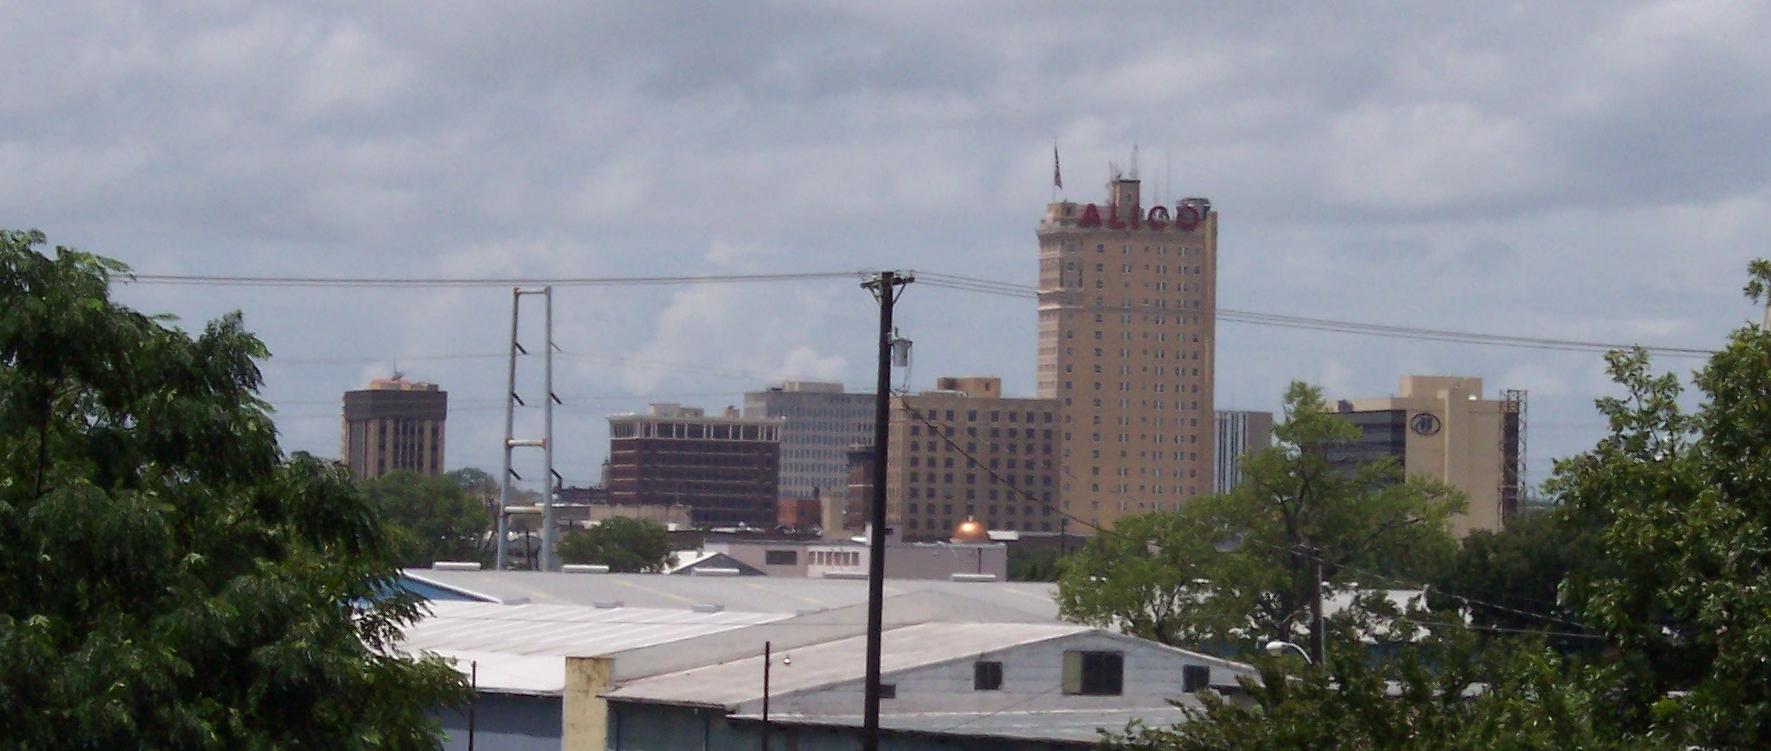 Waco Texas